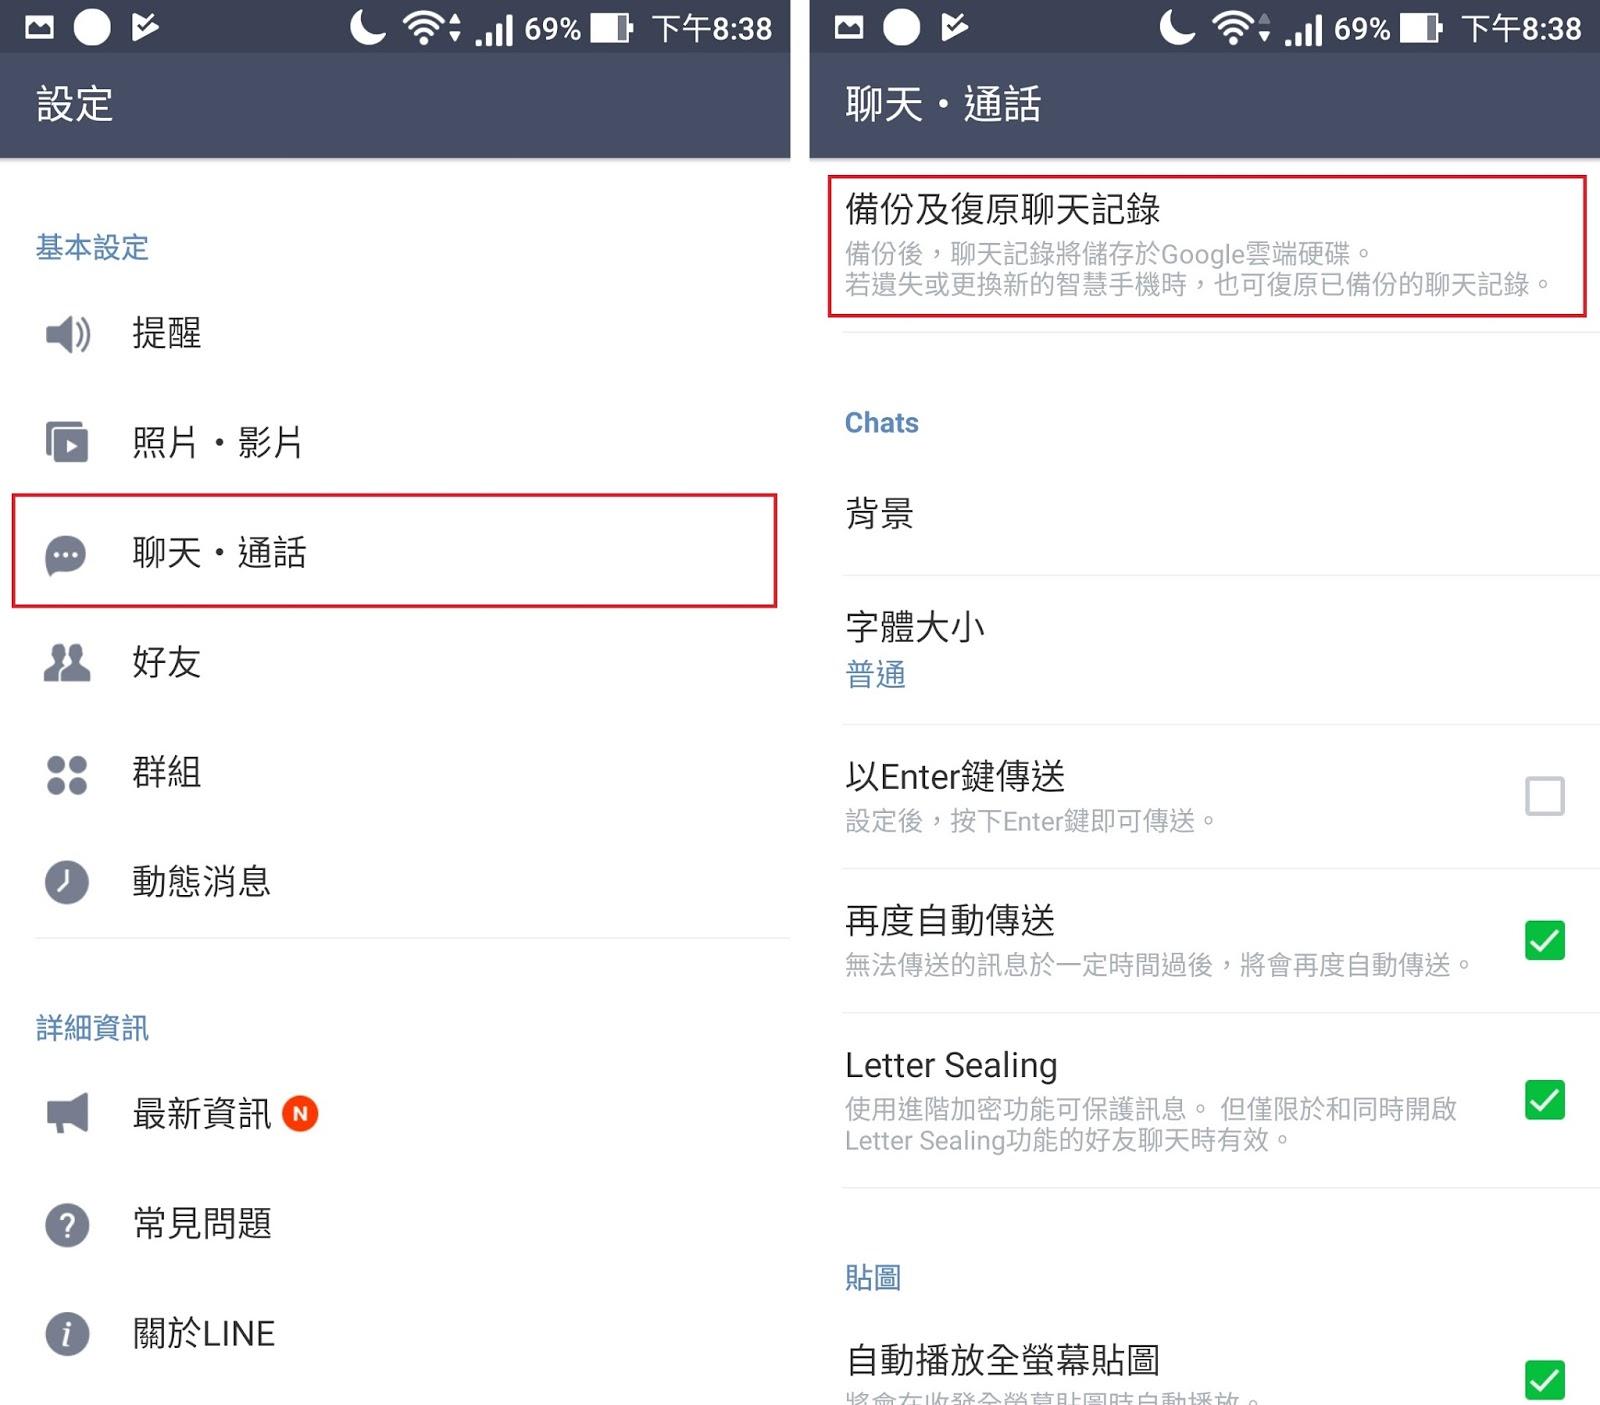 Screenshot 20170531 203821 - [教學] Line 終於開放 Android 使用者「雲端備份」聊天紀錄!趕快來更新吧!